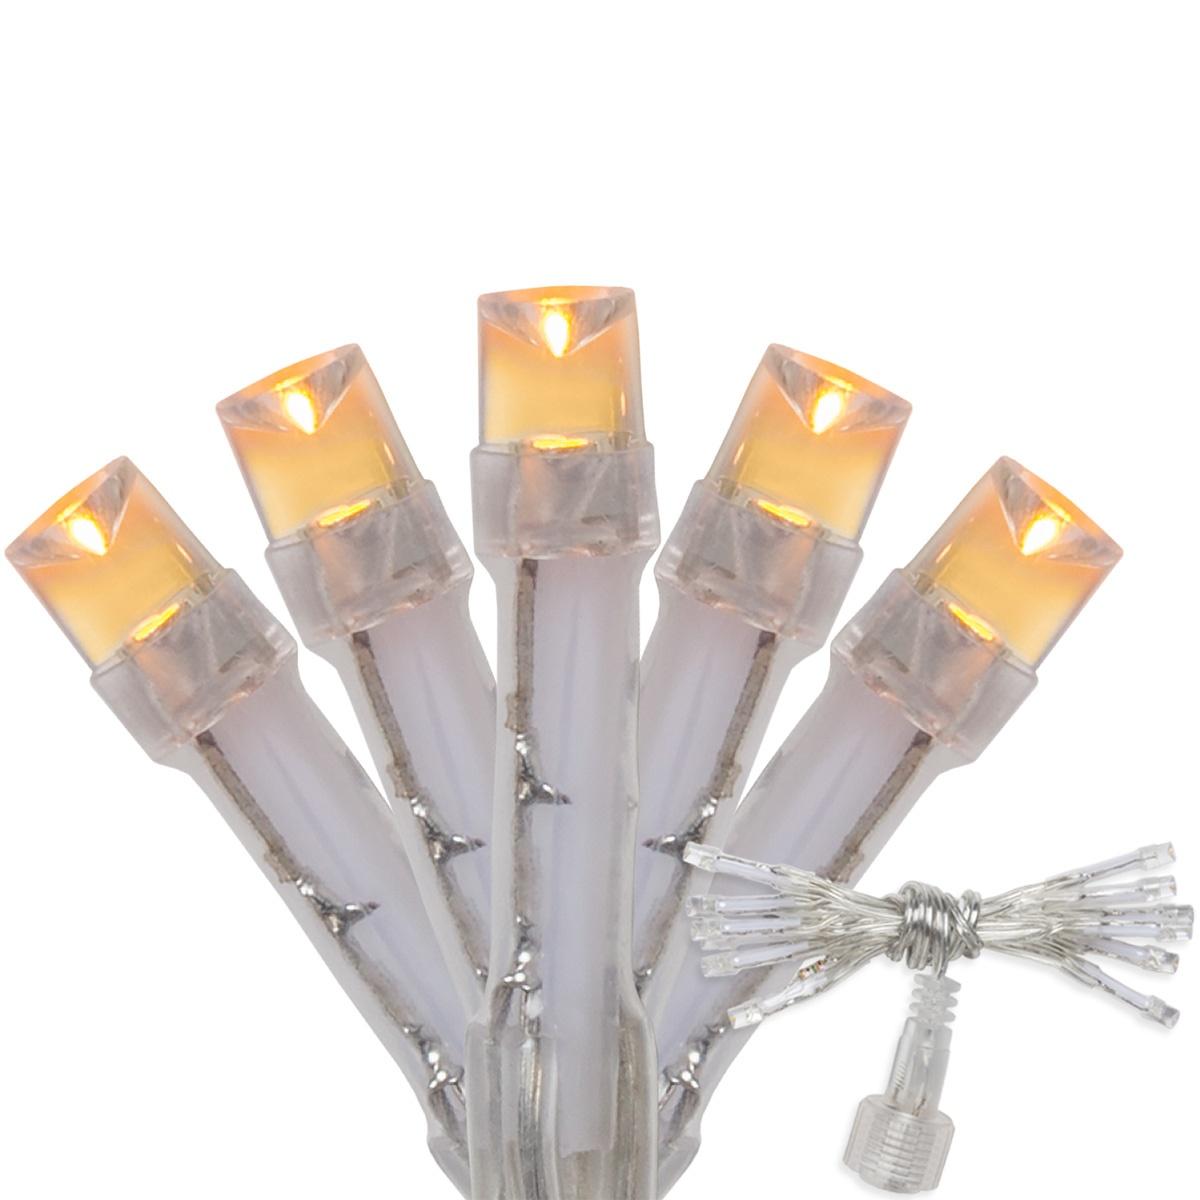 Aurora Superstar TM Light String, 12 Gold LED Mini Lights, Clear Wire